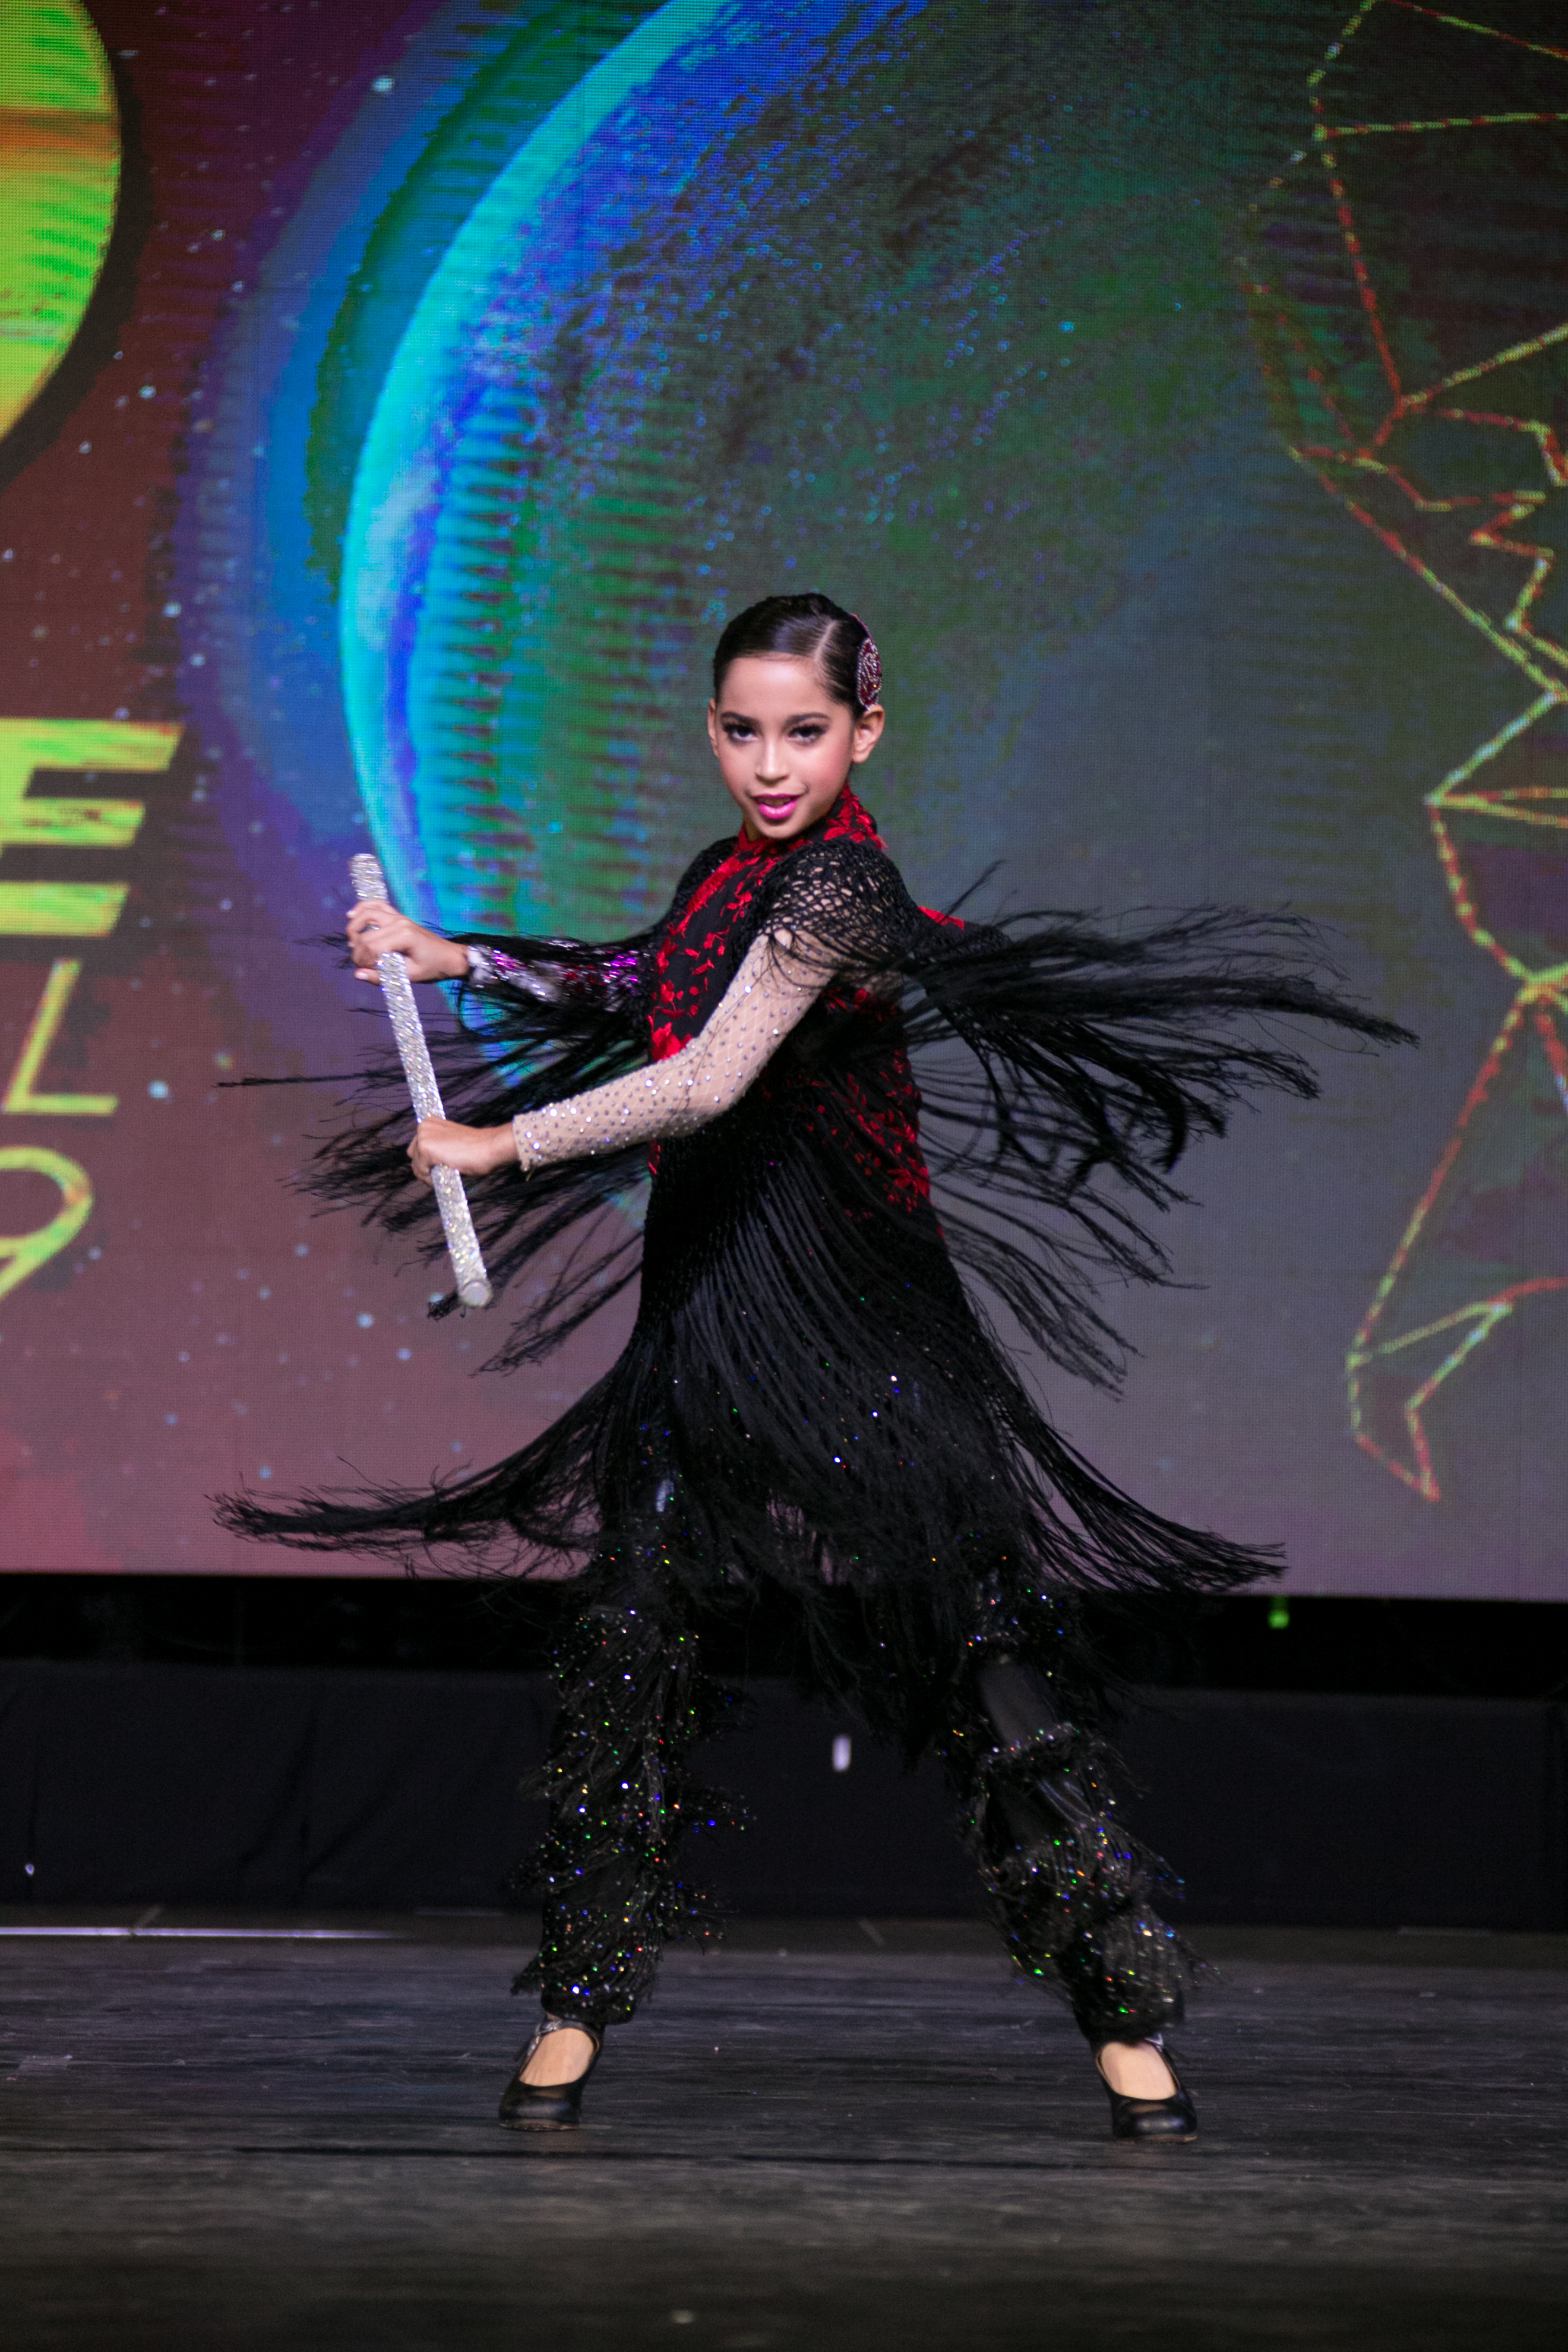 Miranda Torres, 'Mejor bailarina Junior'.